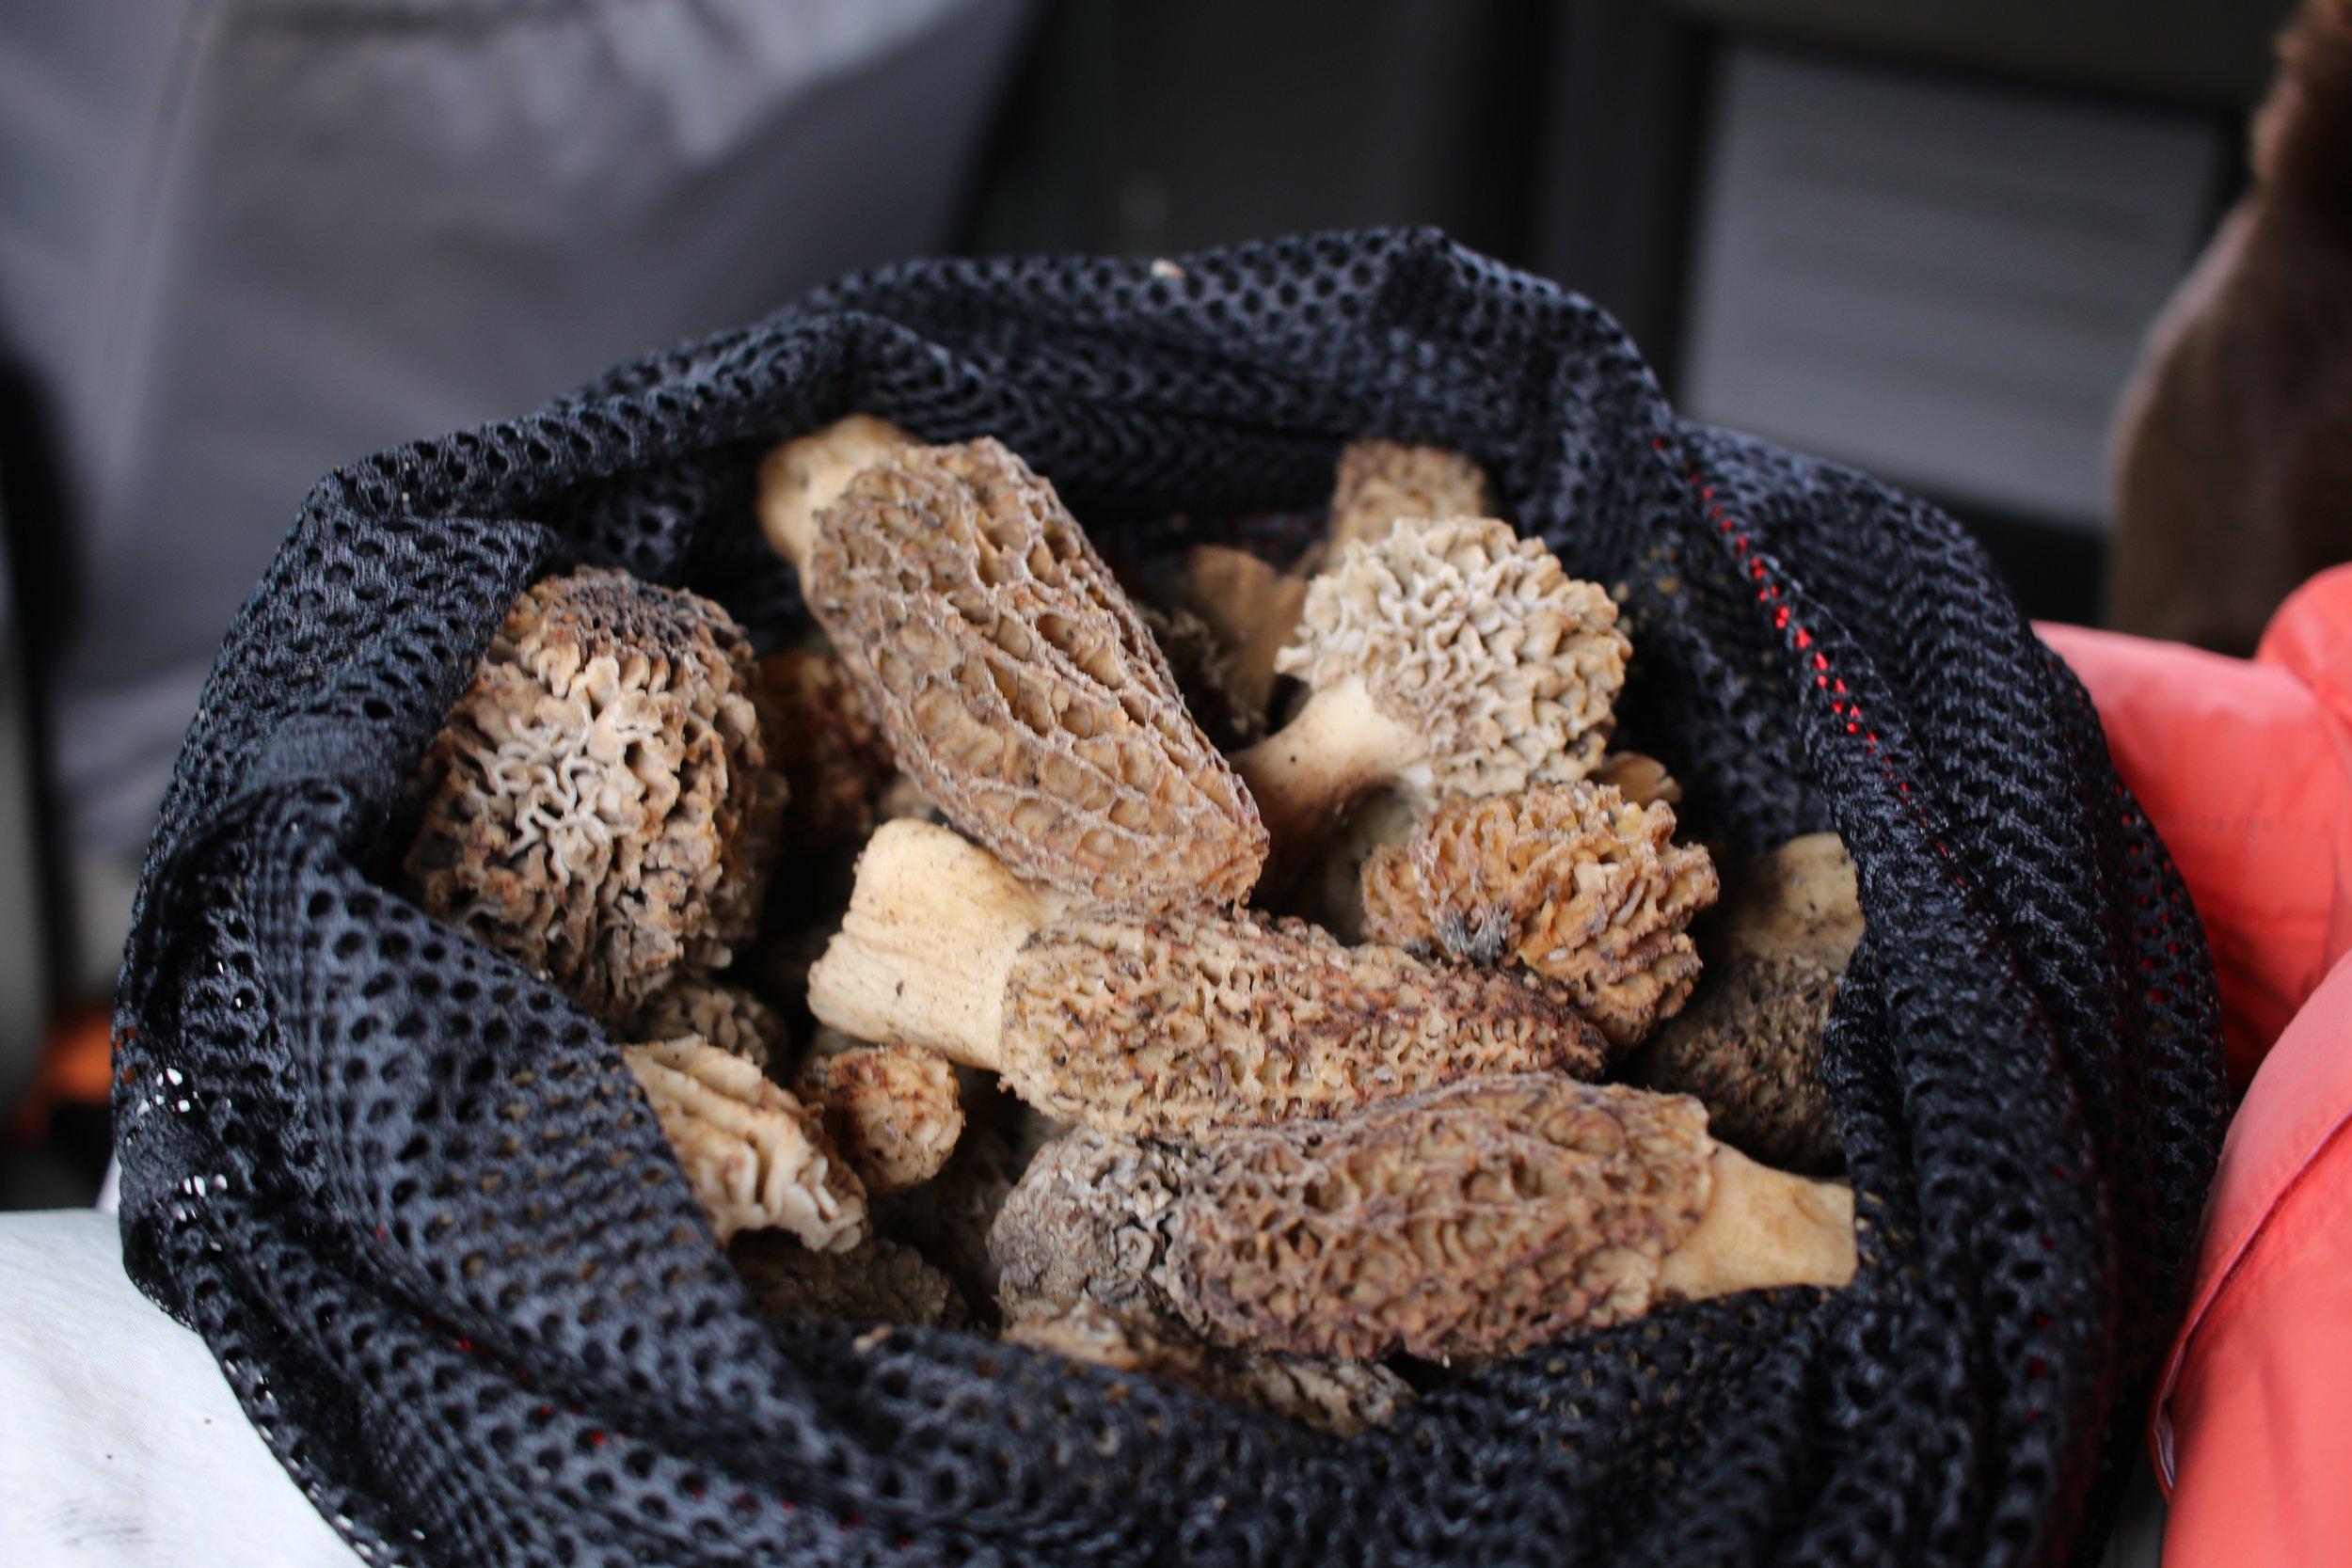 Mushrooms | Greens | blackberry | acorn | Wild grains | etc.